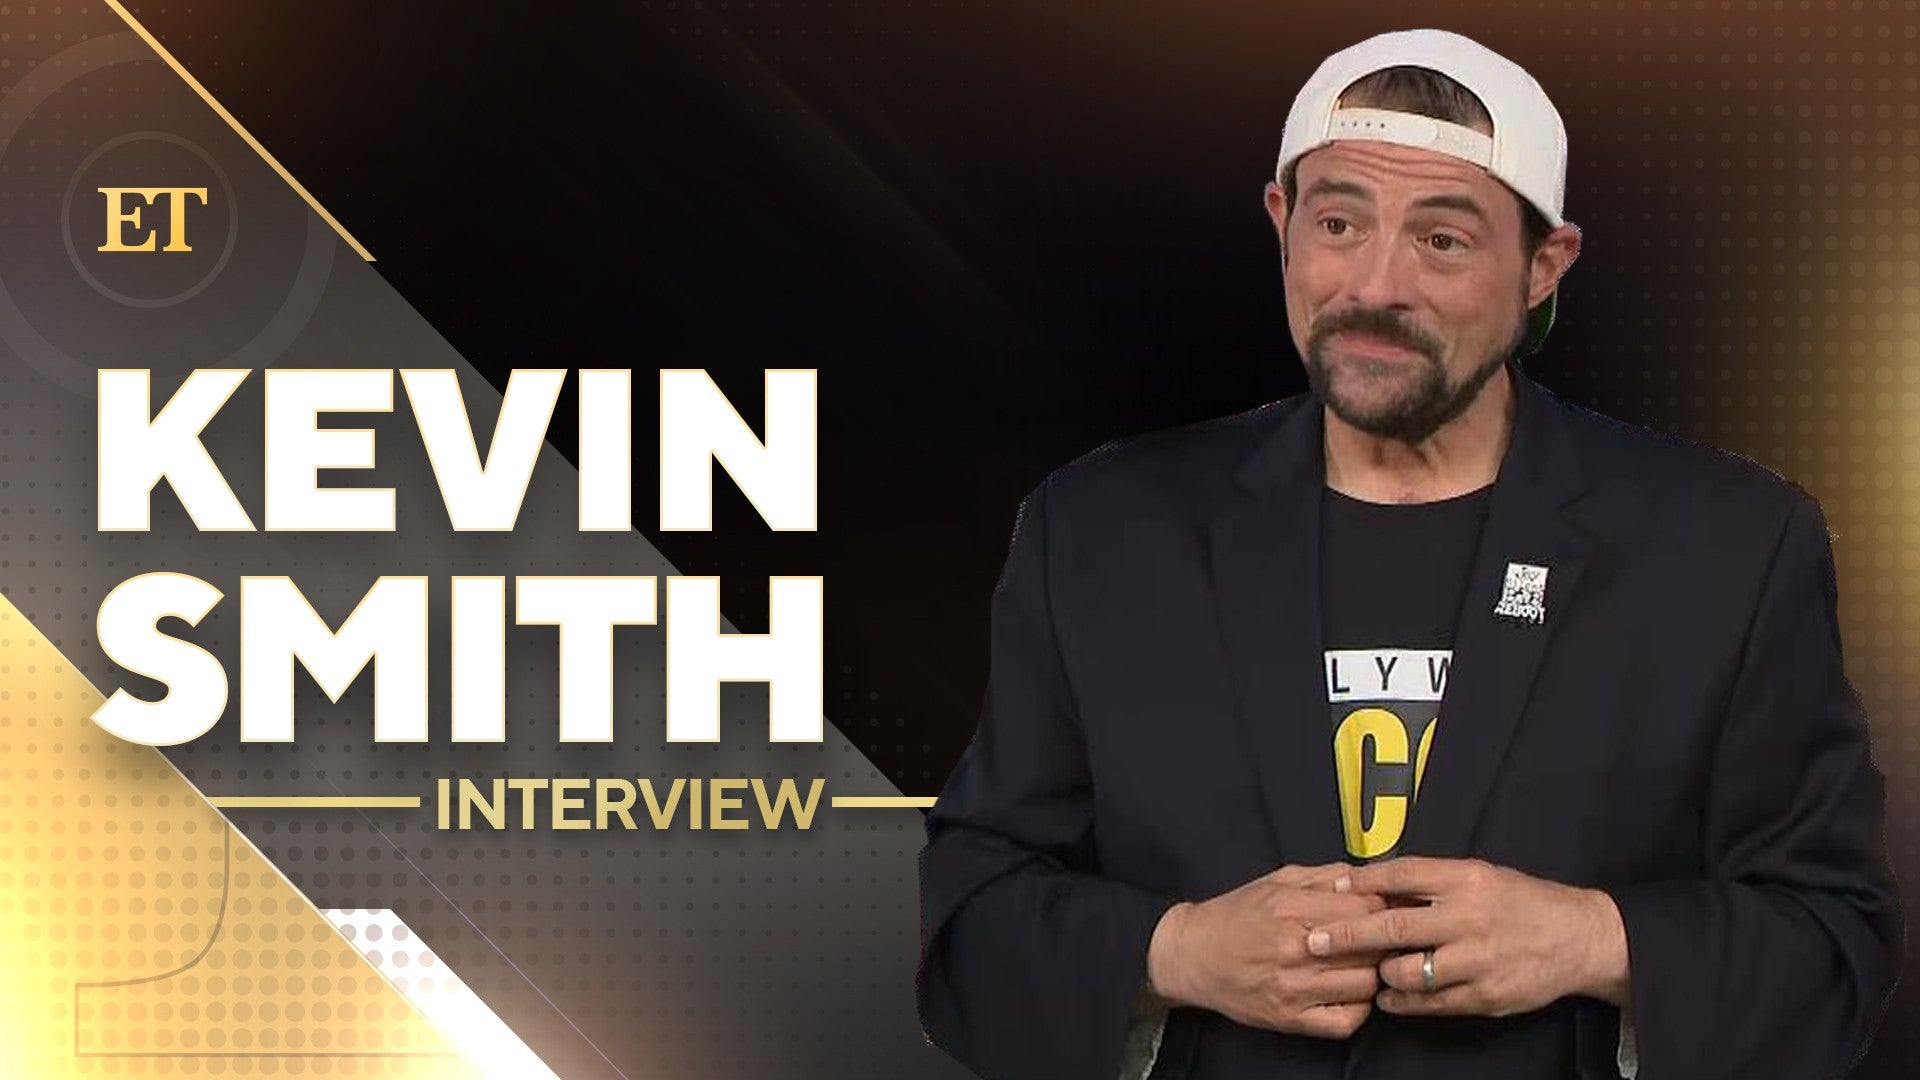 Kevin Smith Says Ben Affleck S Jay And Silent Bob Reboot Cameo